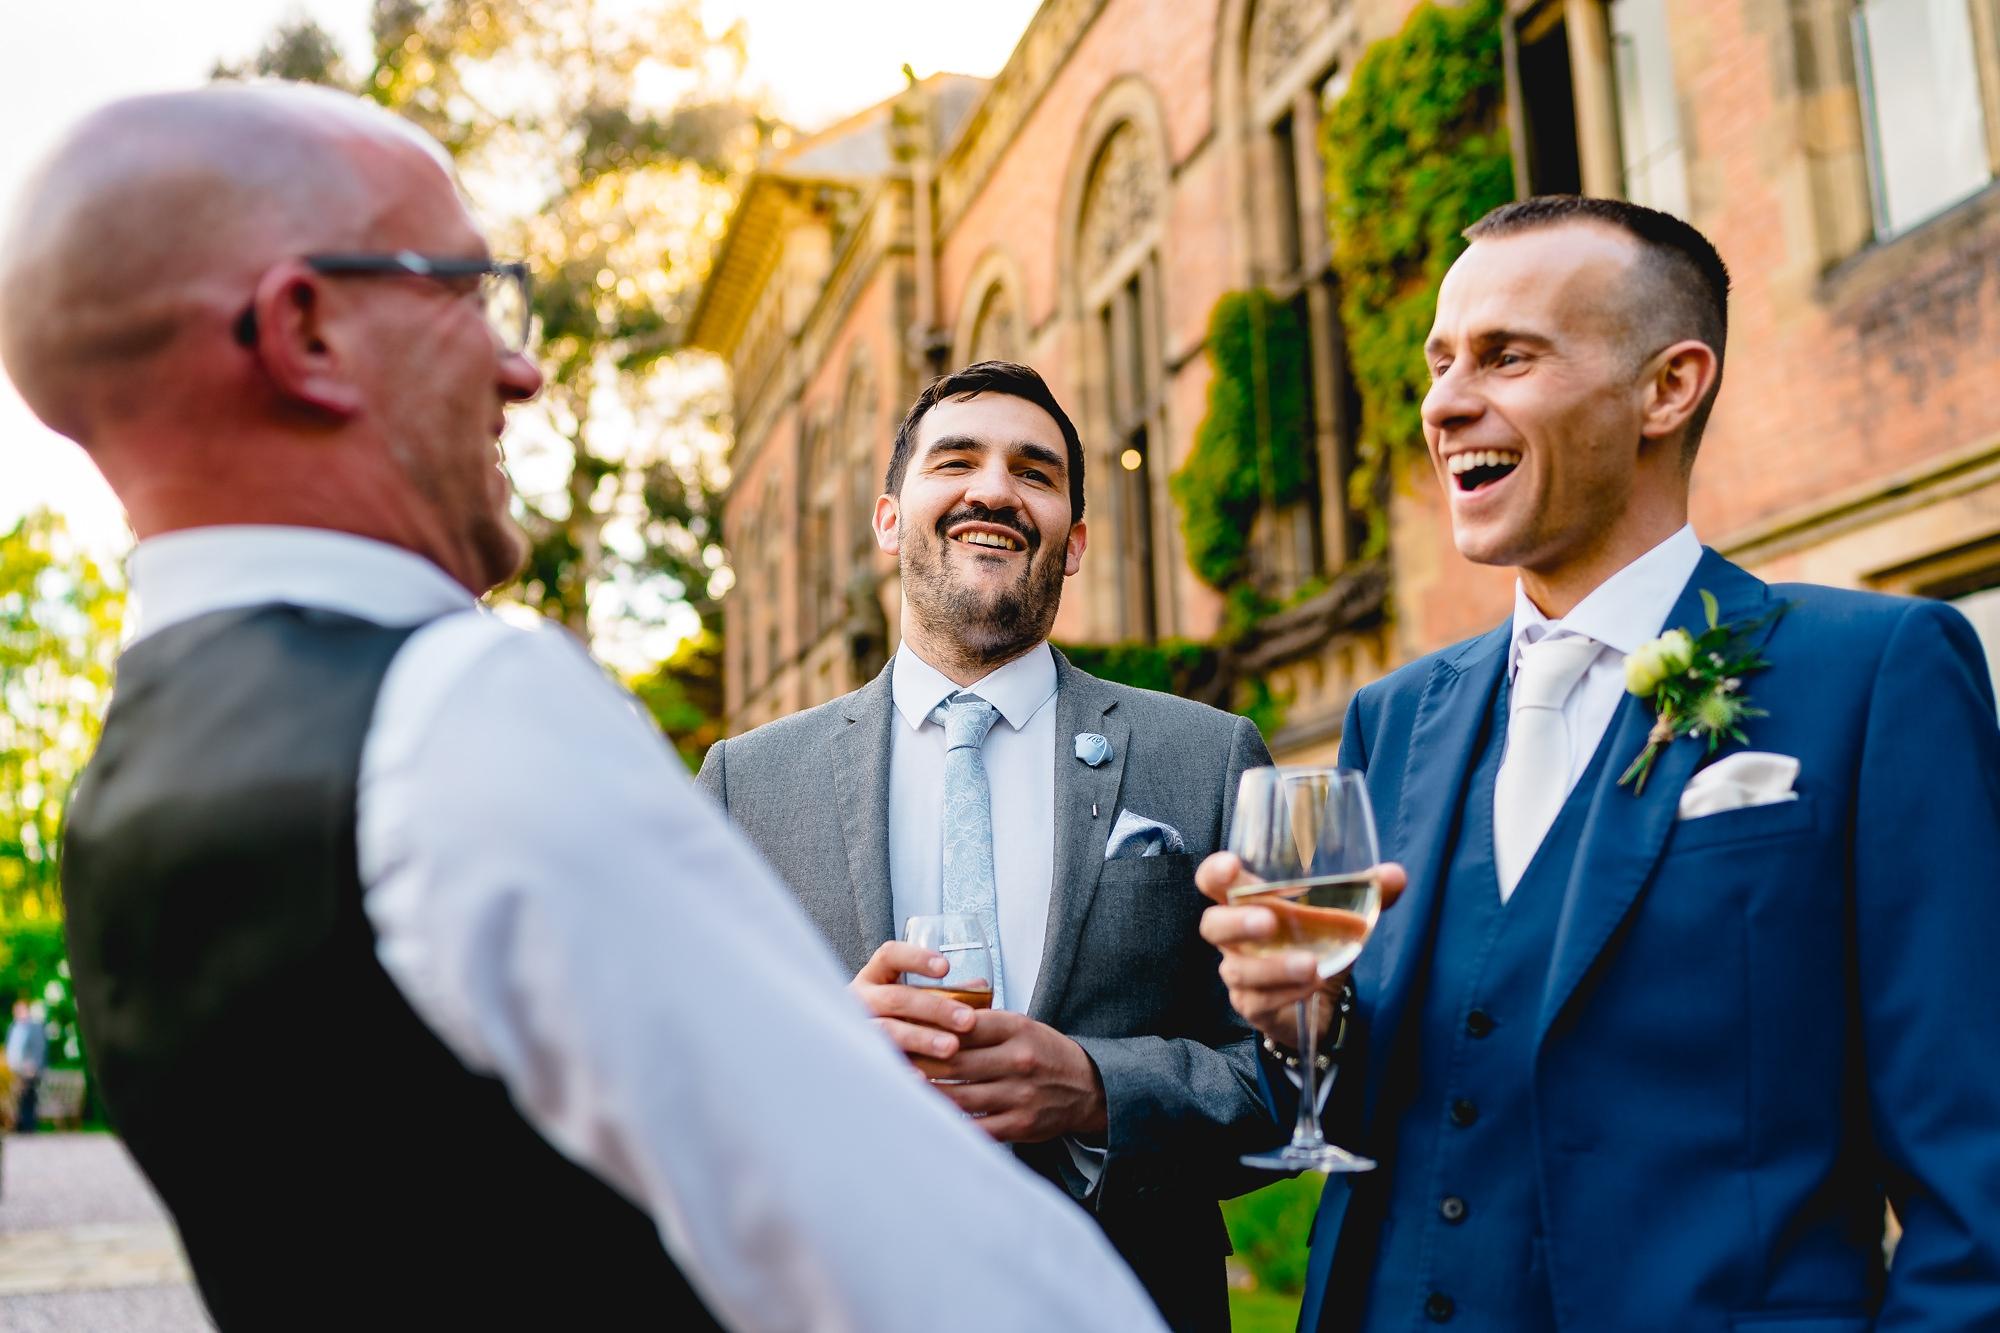 Soughton-Hall-Wedding-Photographer_0019.jpg